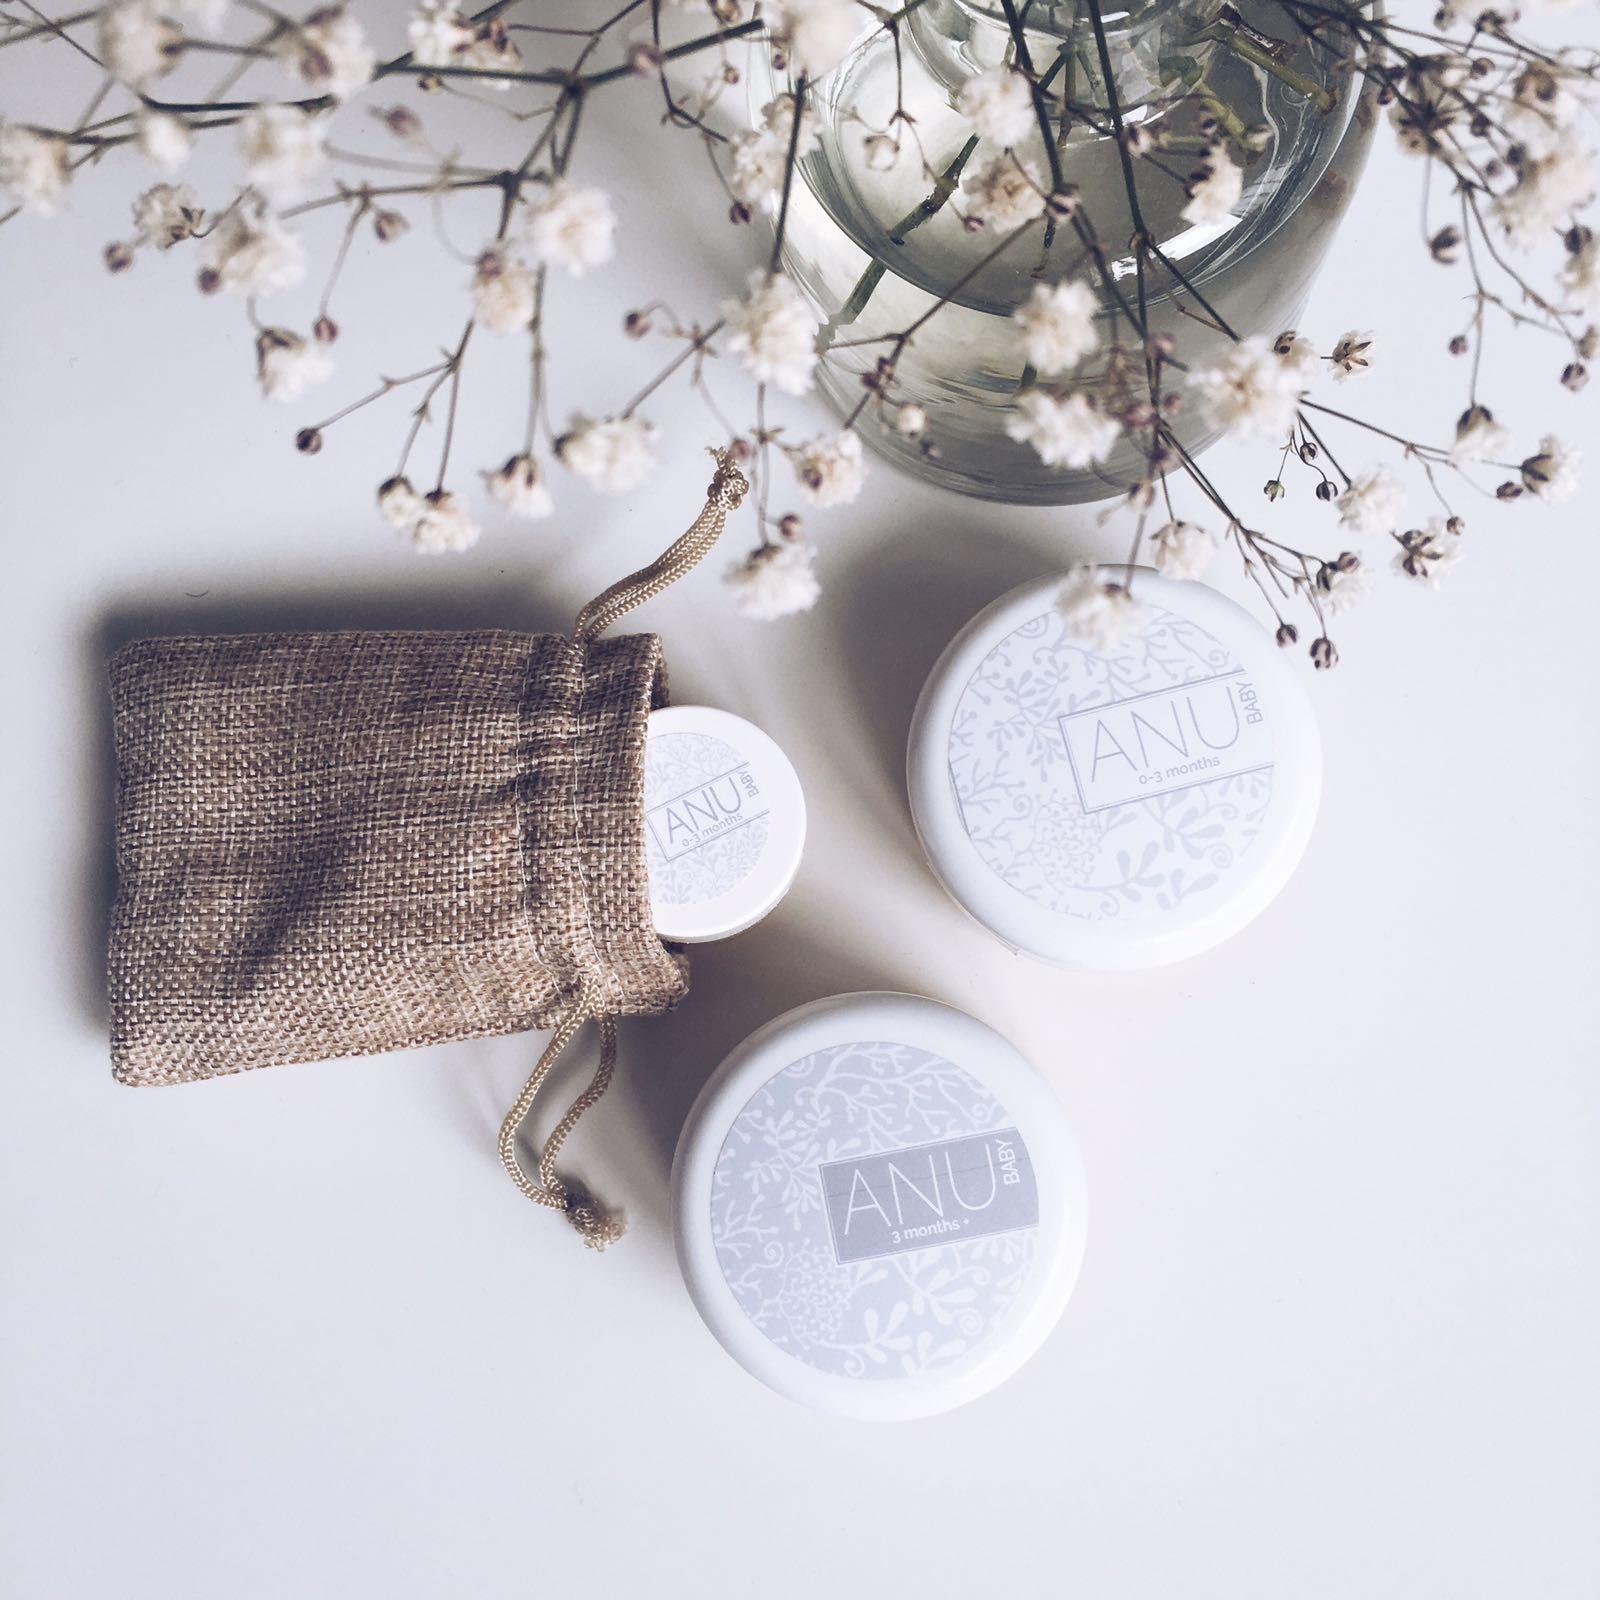 natural skincare items from Anu